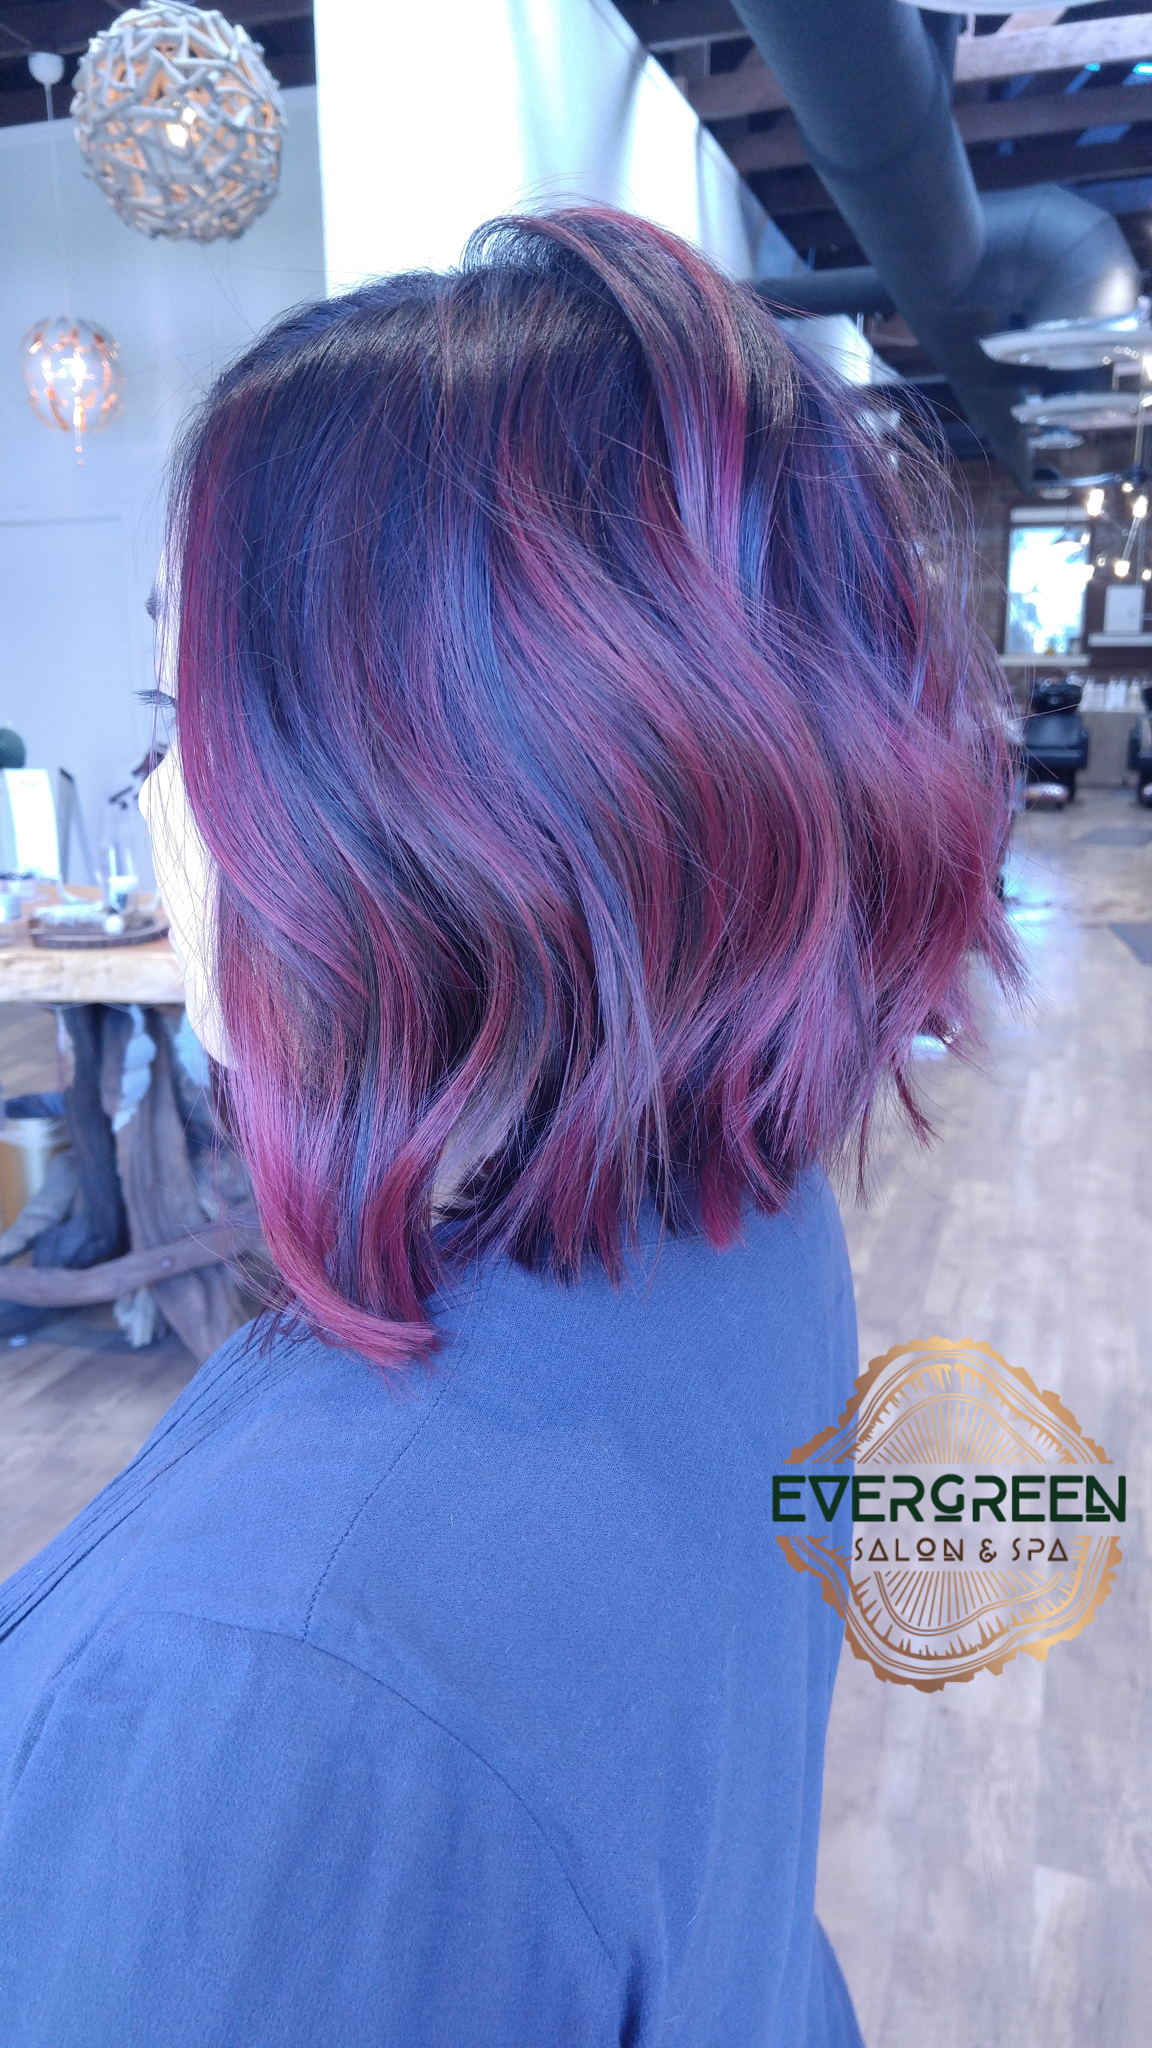 Black purple pink red blue color hair short medium length hair wavy